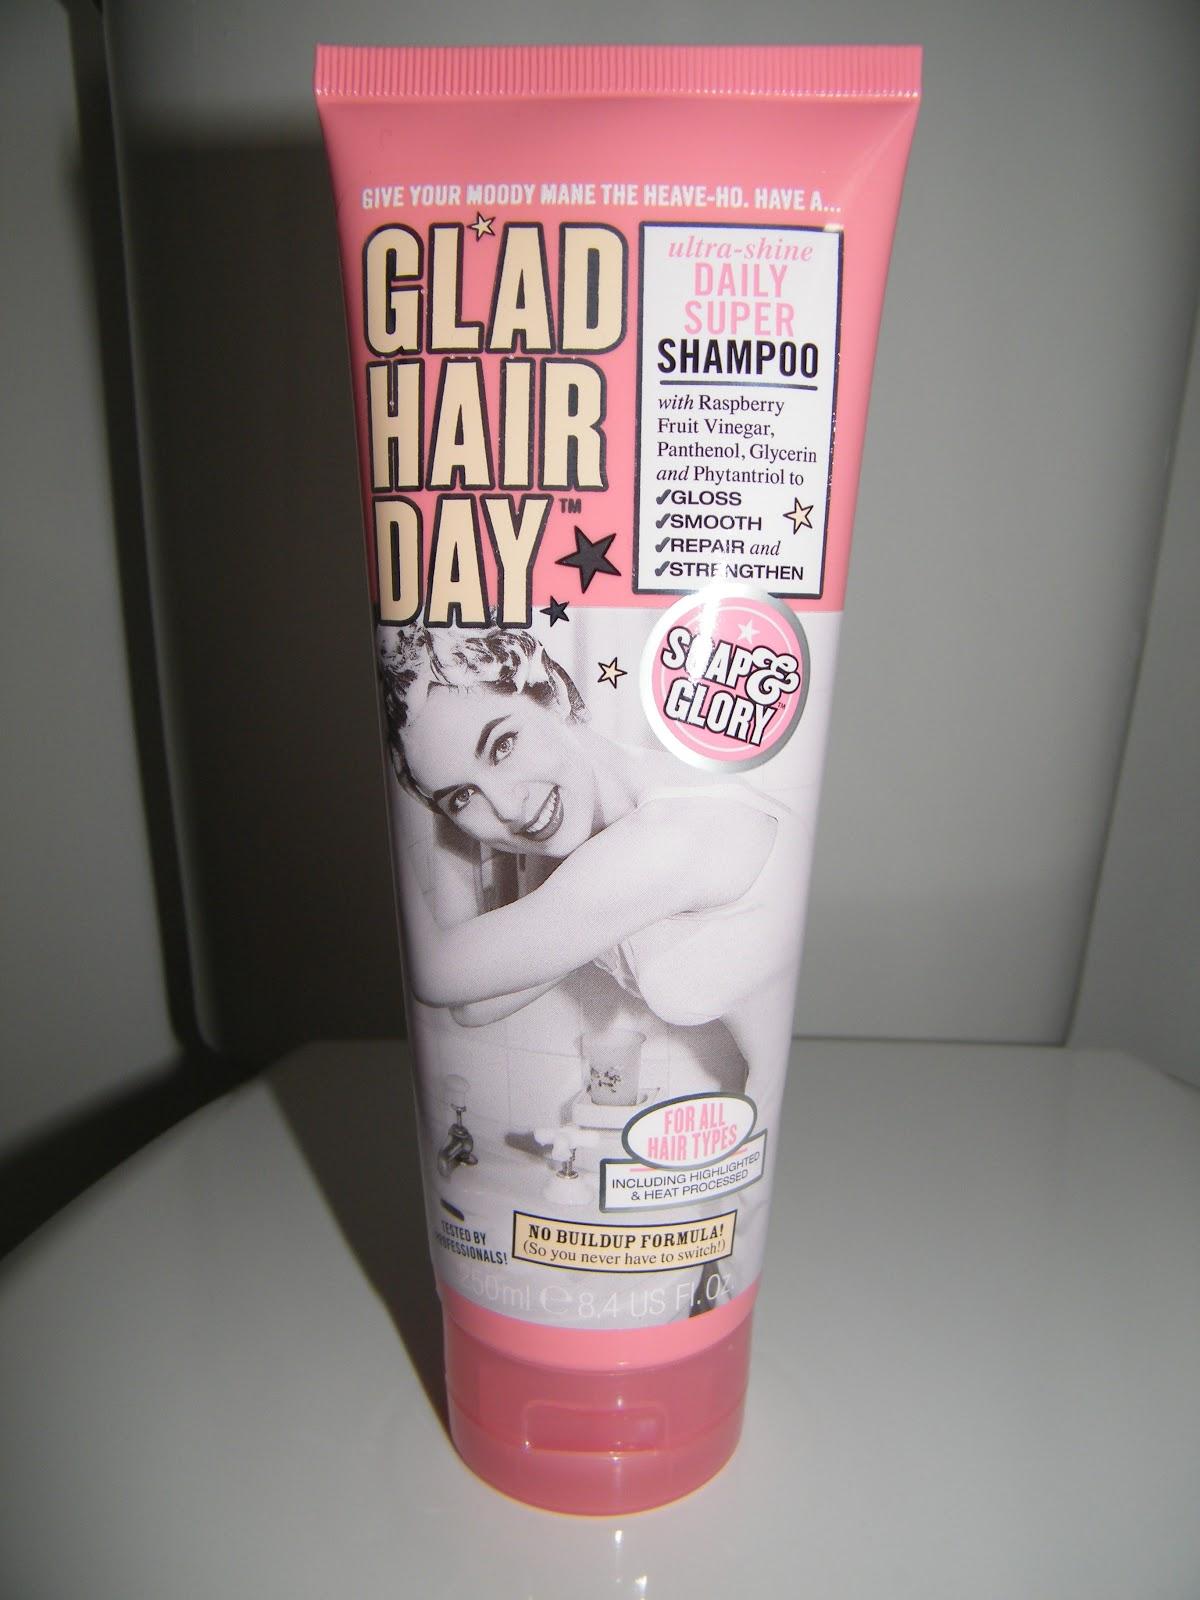 Soap and Glory Glad Hair Day Shampoo